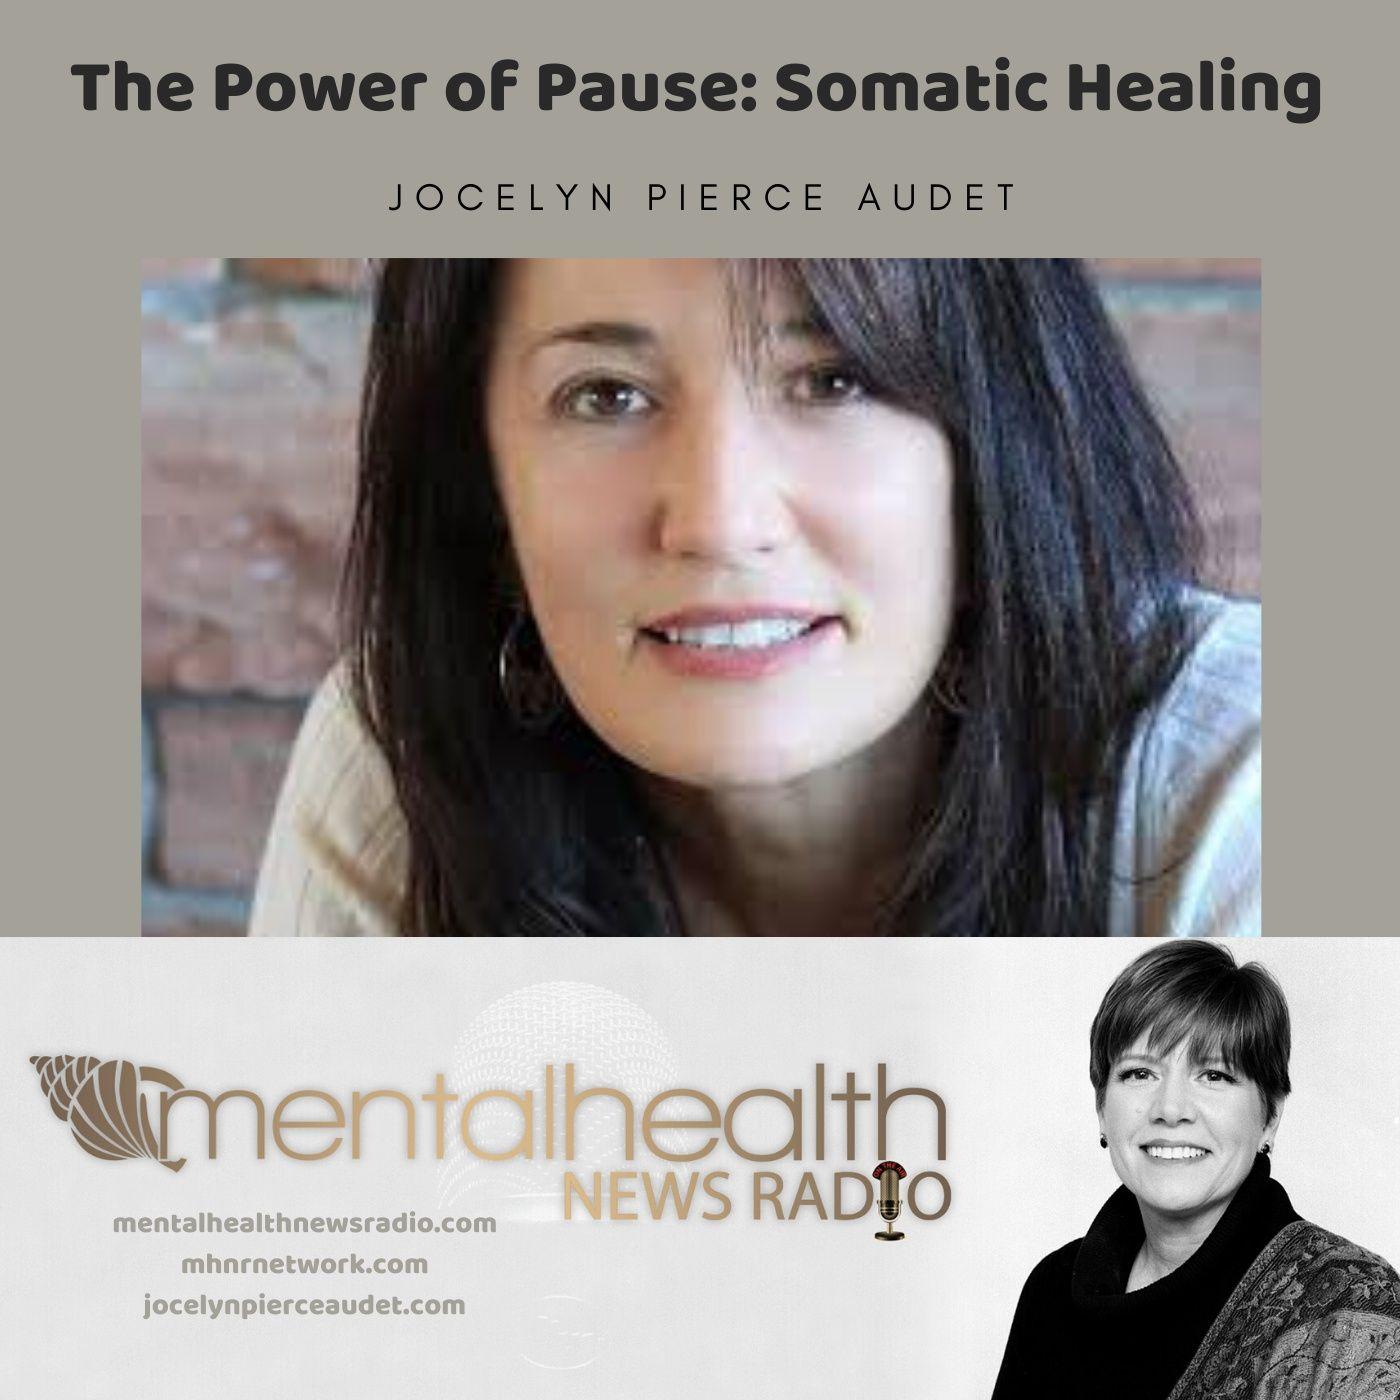 Mental Health News Radio - The Power of Pause: Somatic Healing